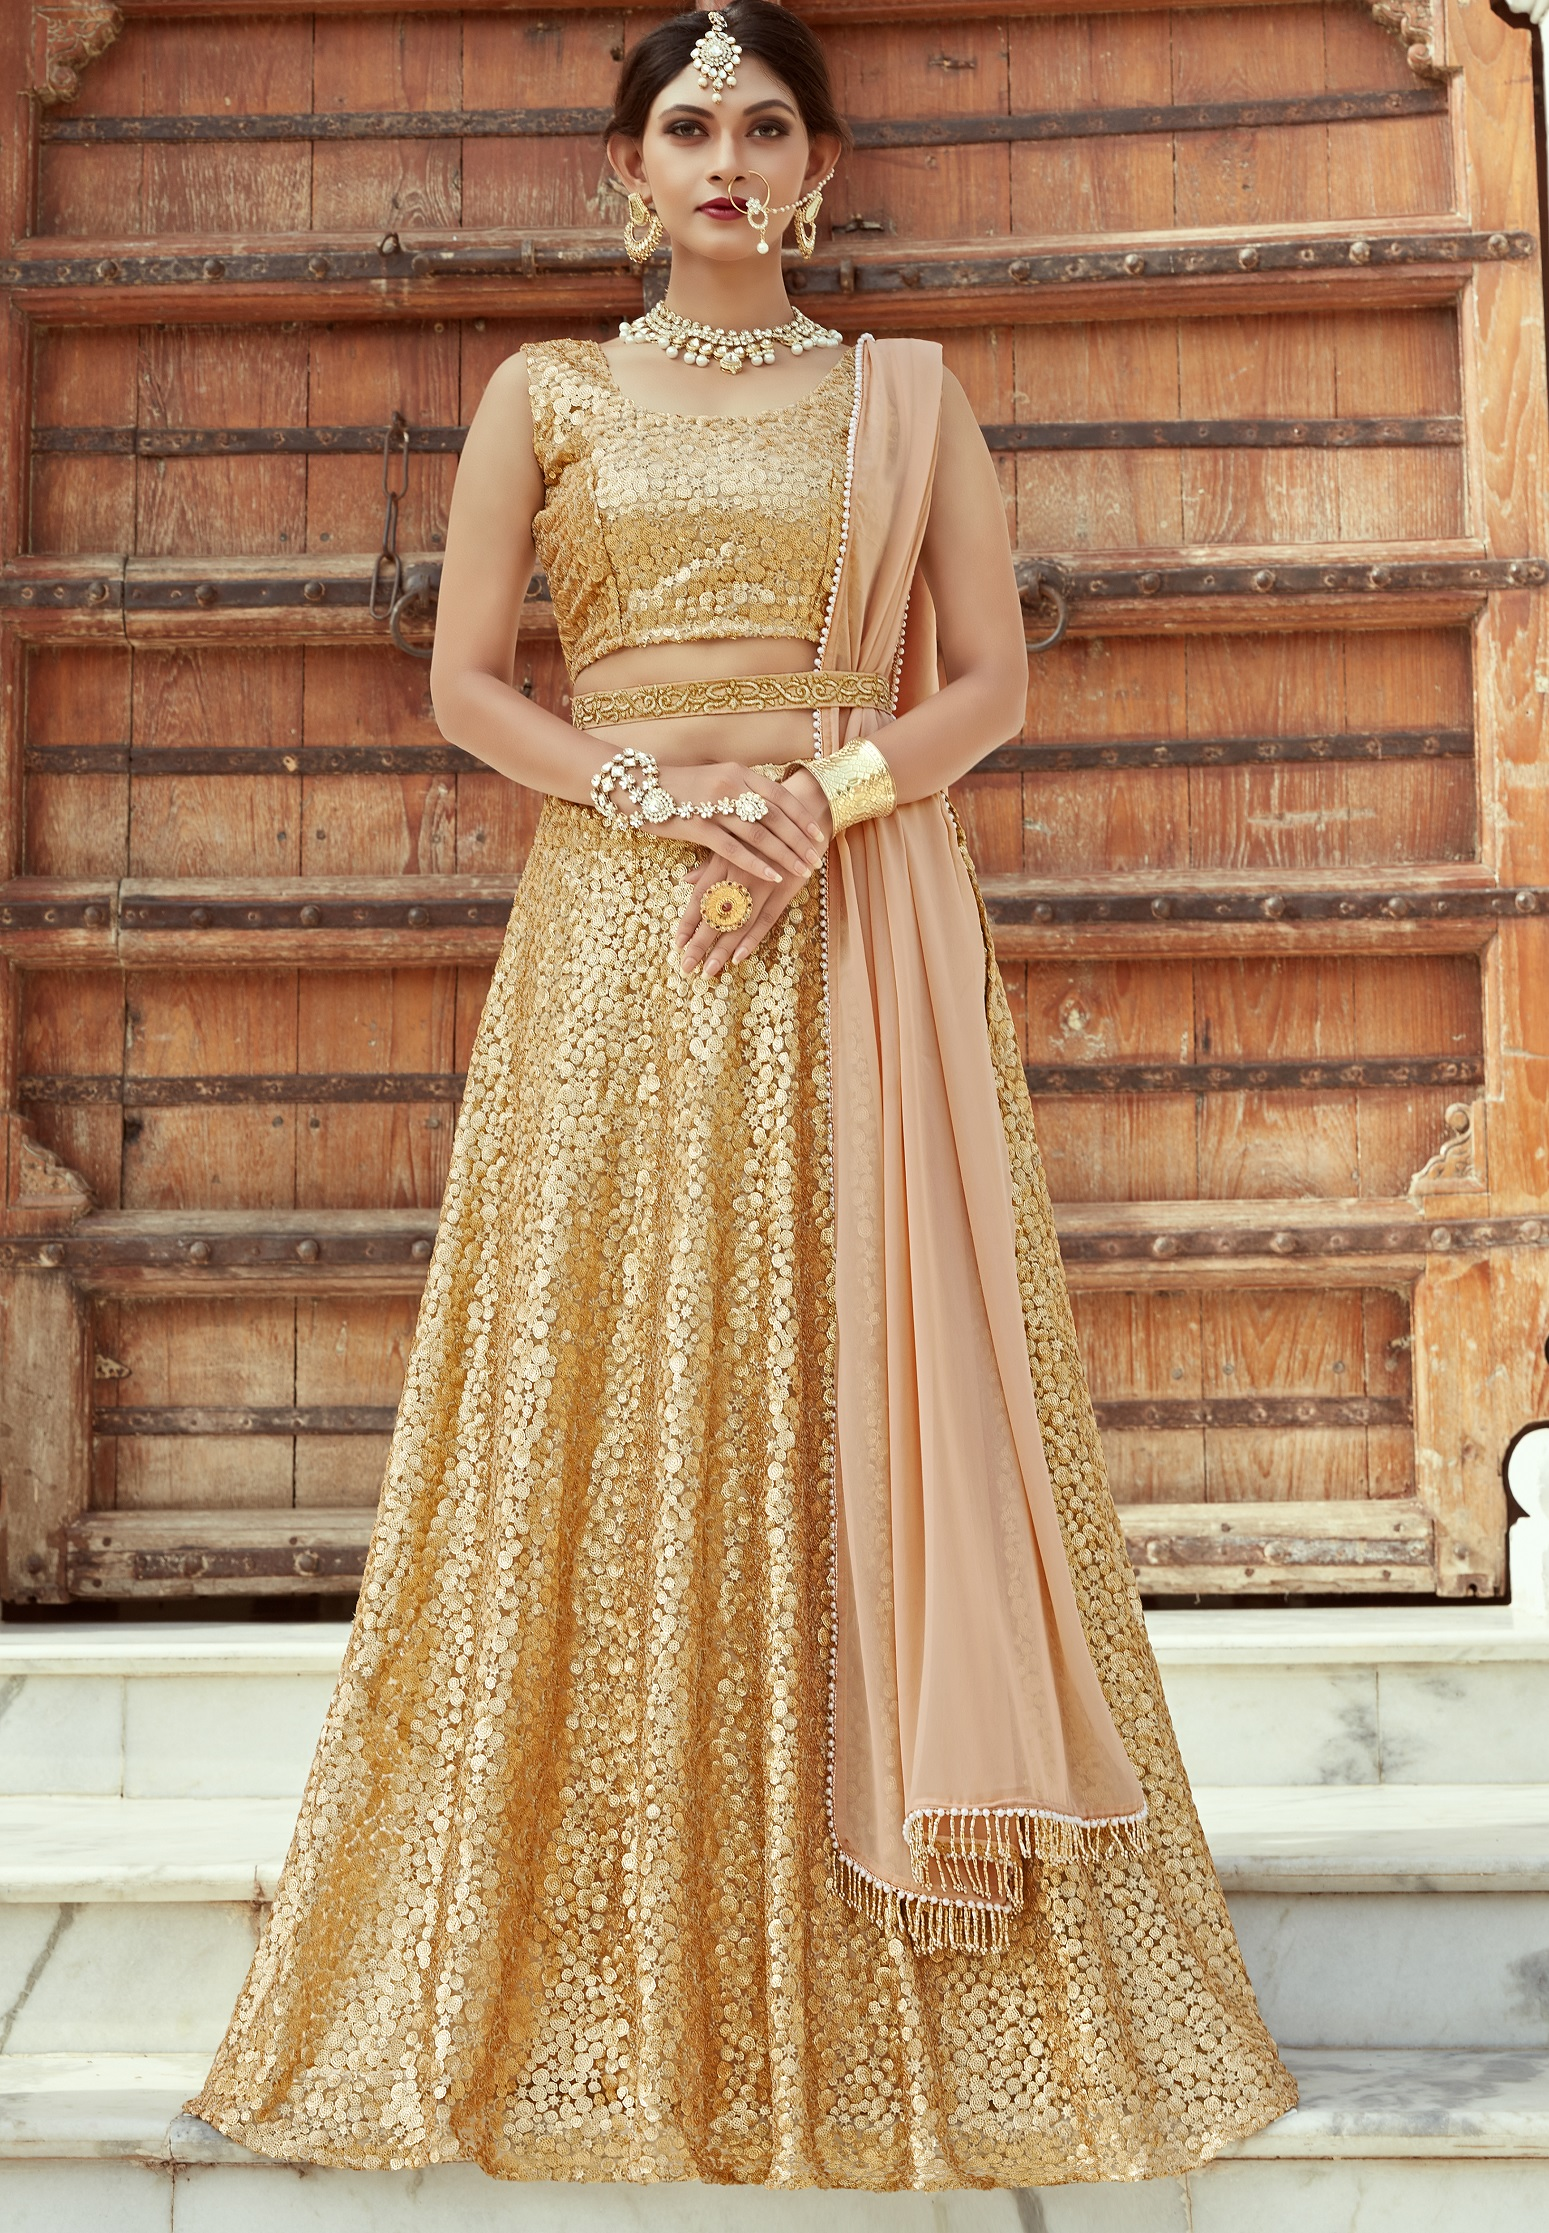 Indian Dress Gold Color Bridal Lehenga 1104